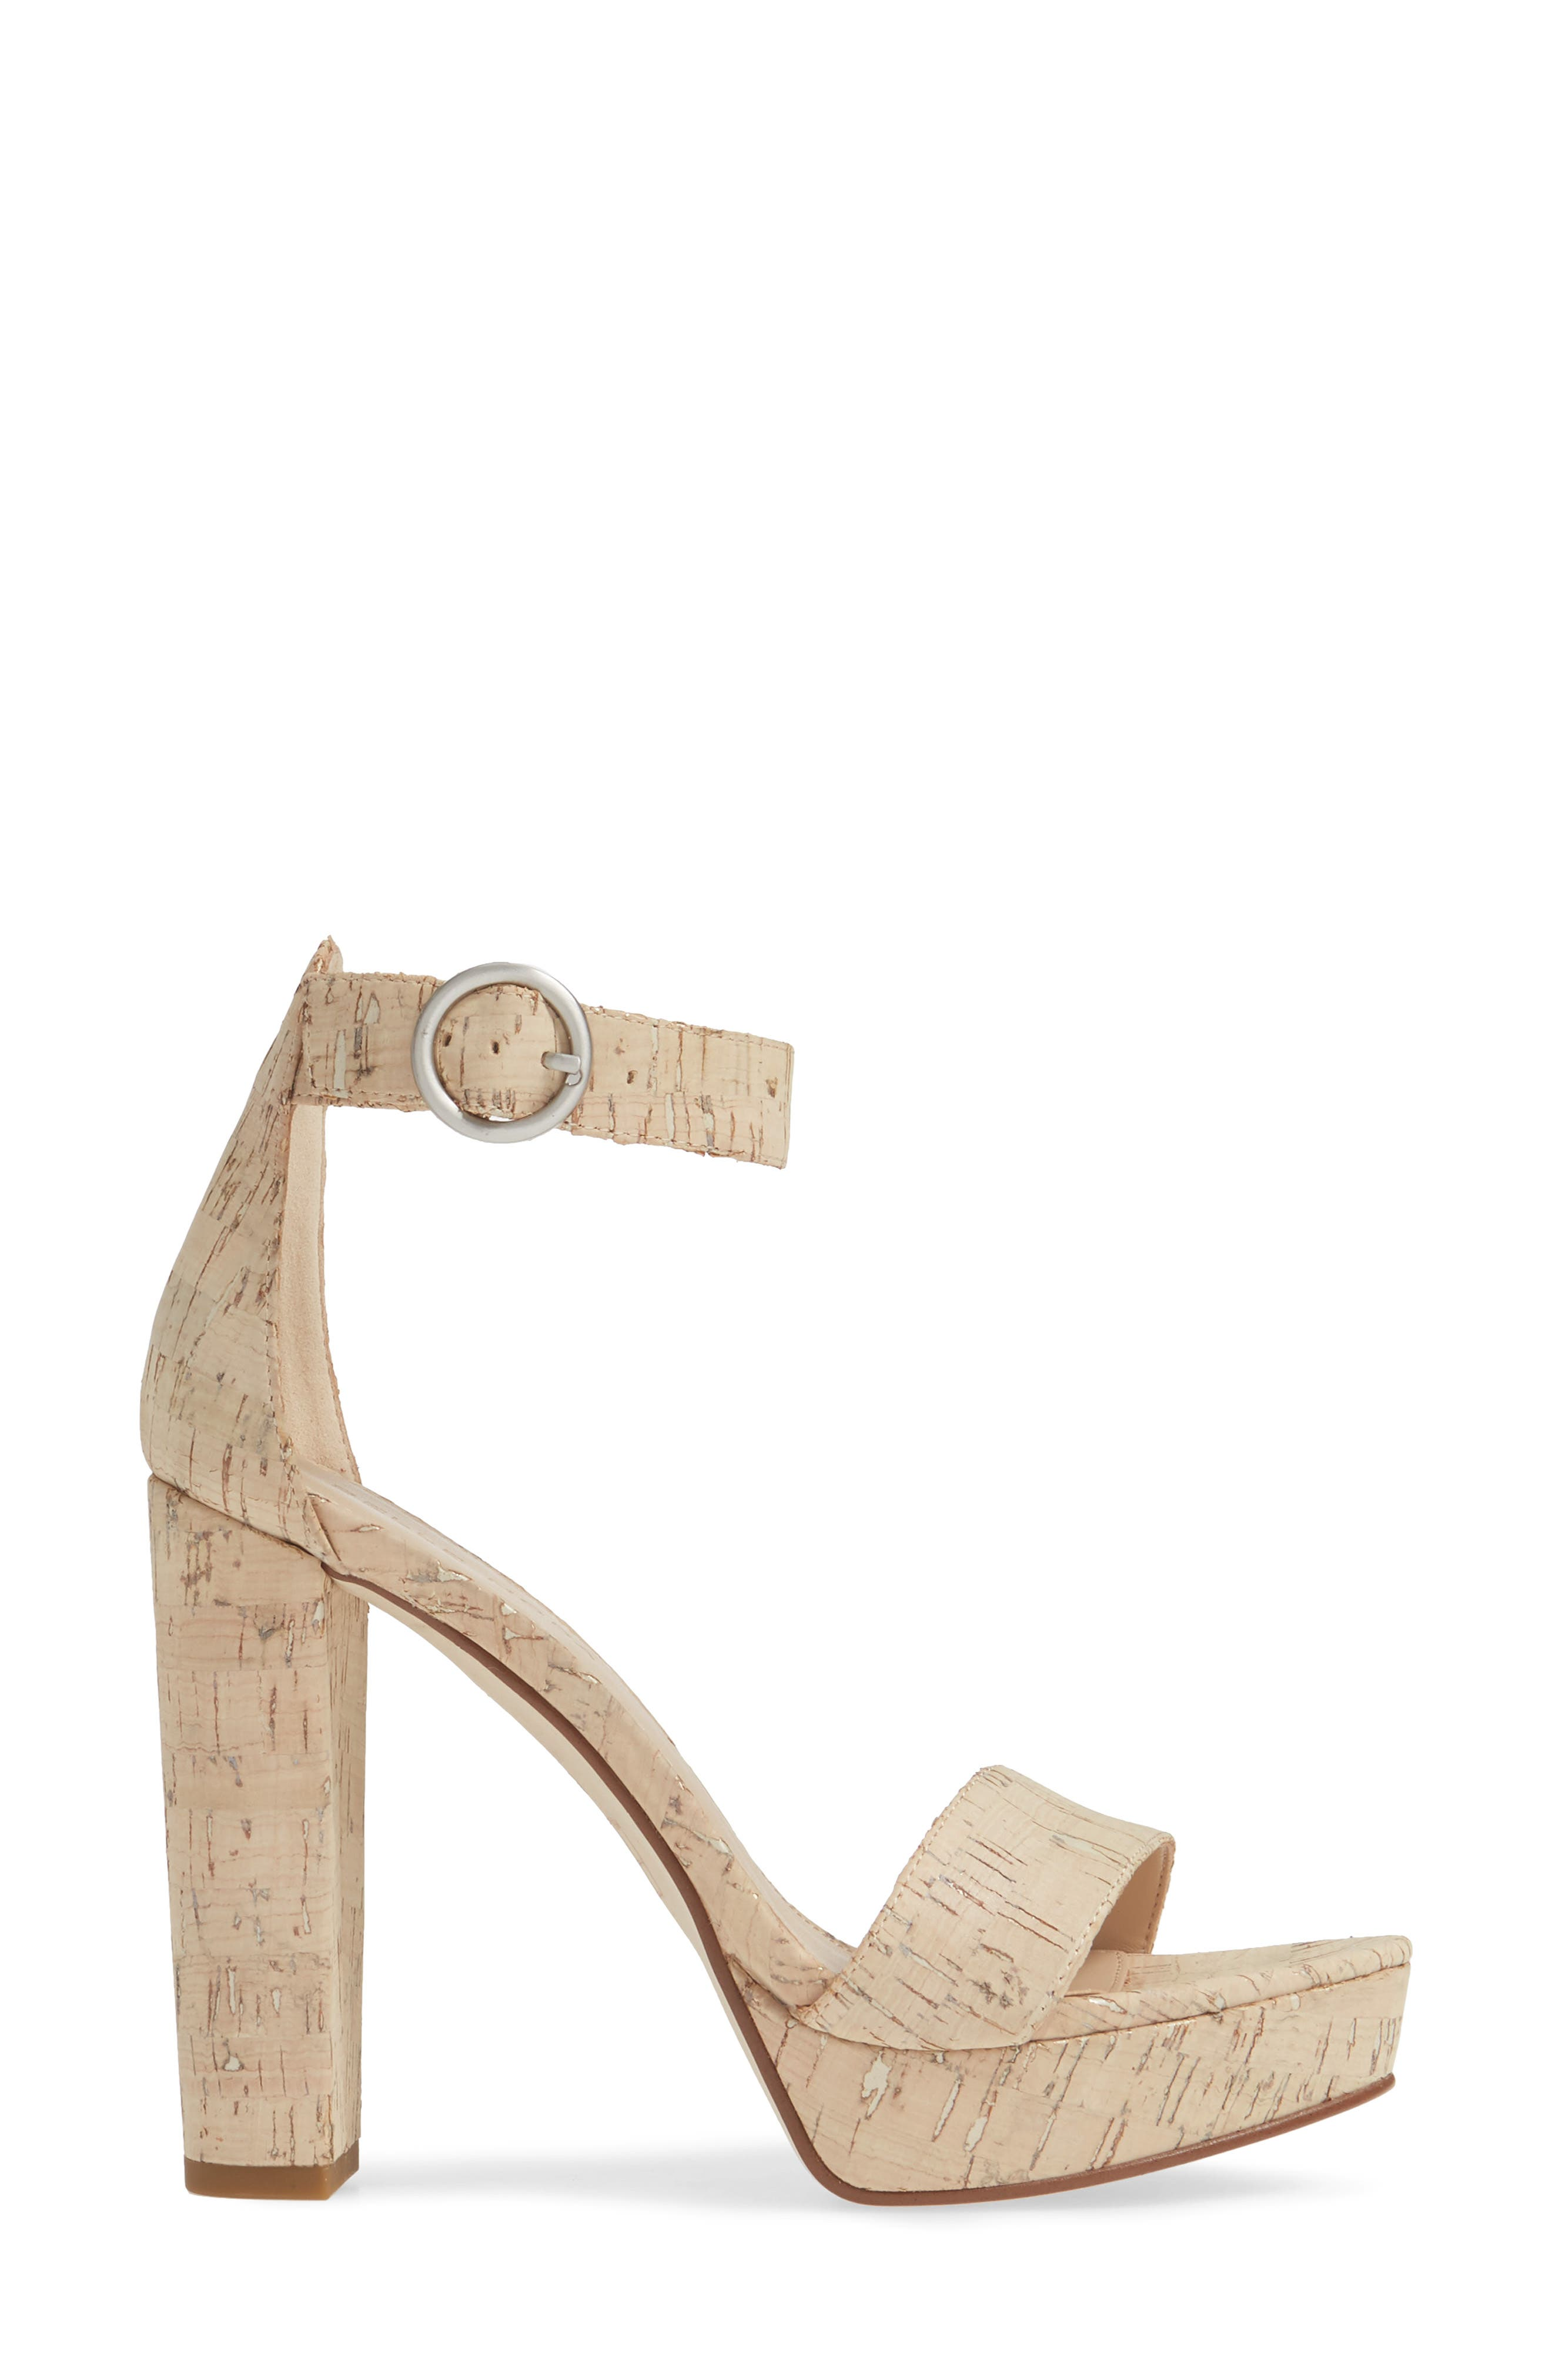 PELLE MODA,                             Palo 2 Platform Sandal,                             Alternate thumbnail 3, color,                             WHITE WASHED CORK